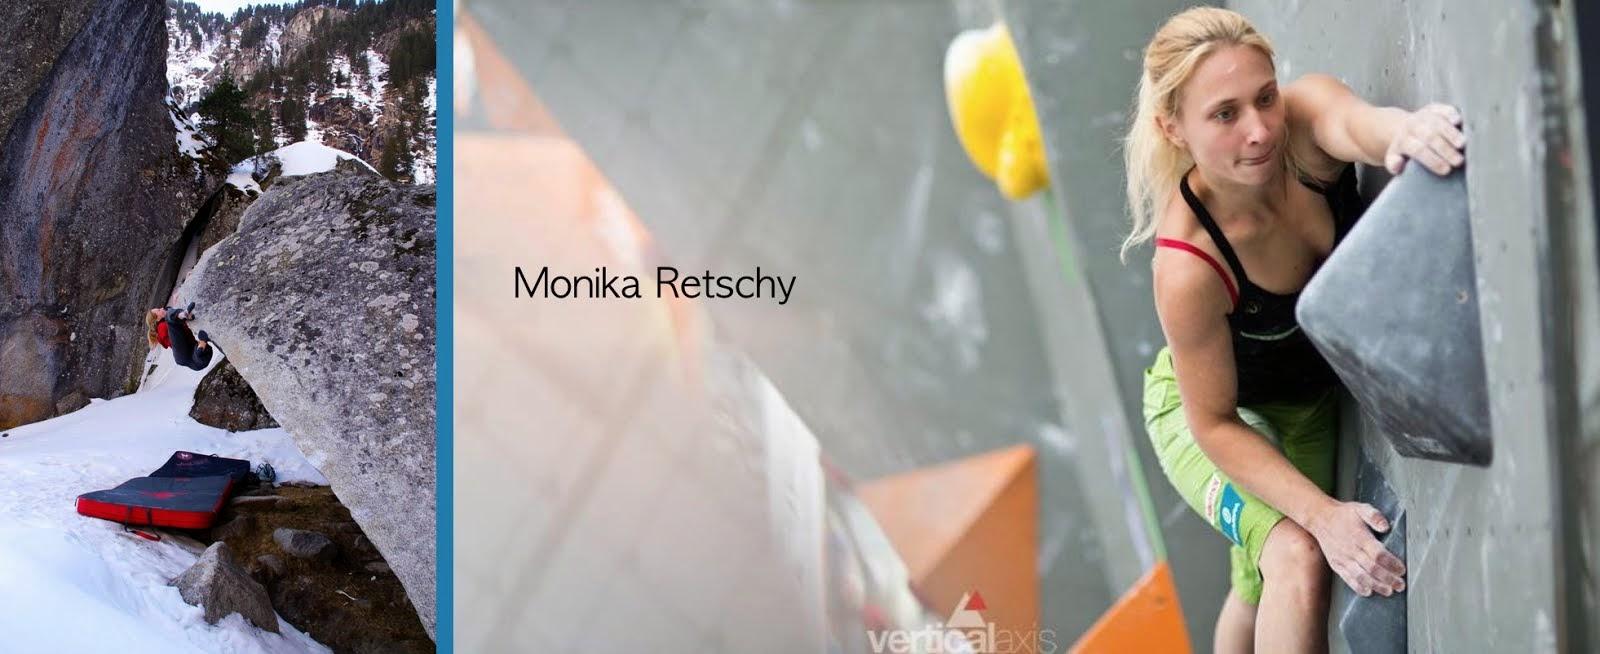 Monika Retschy